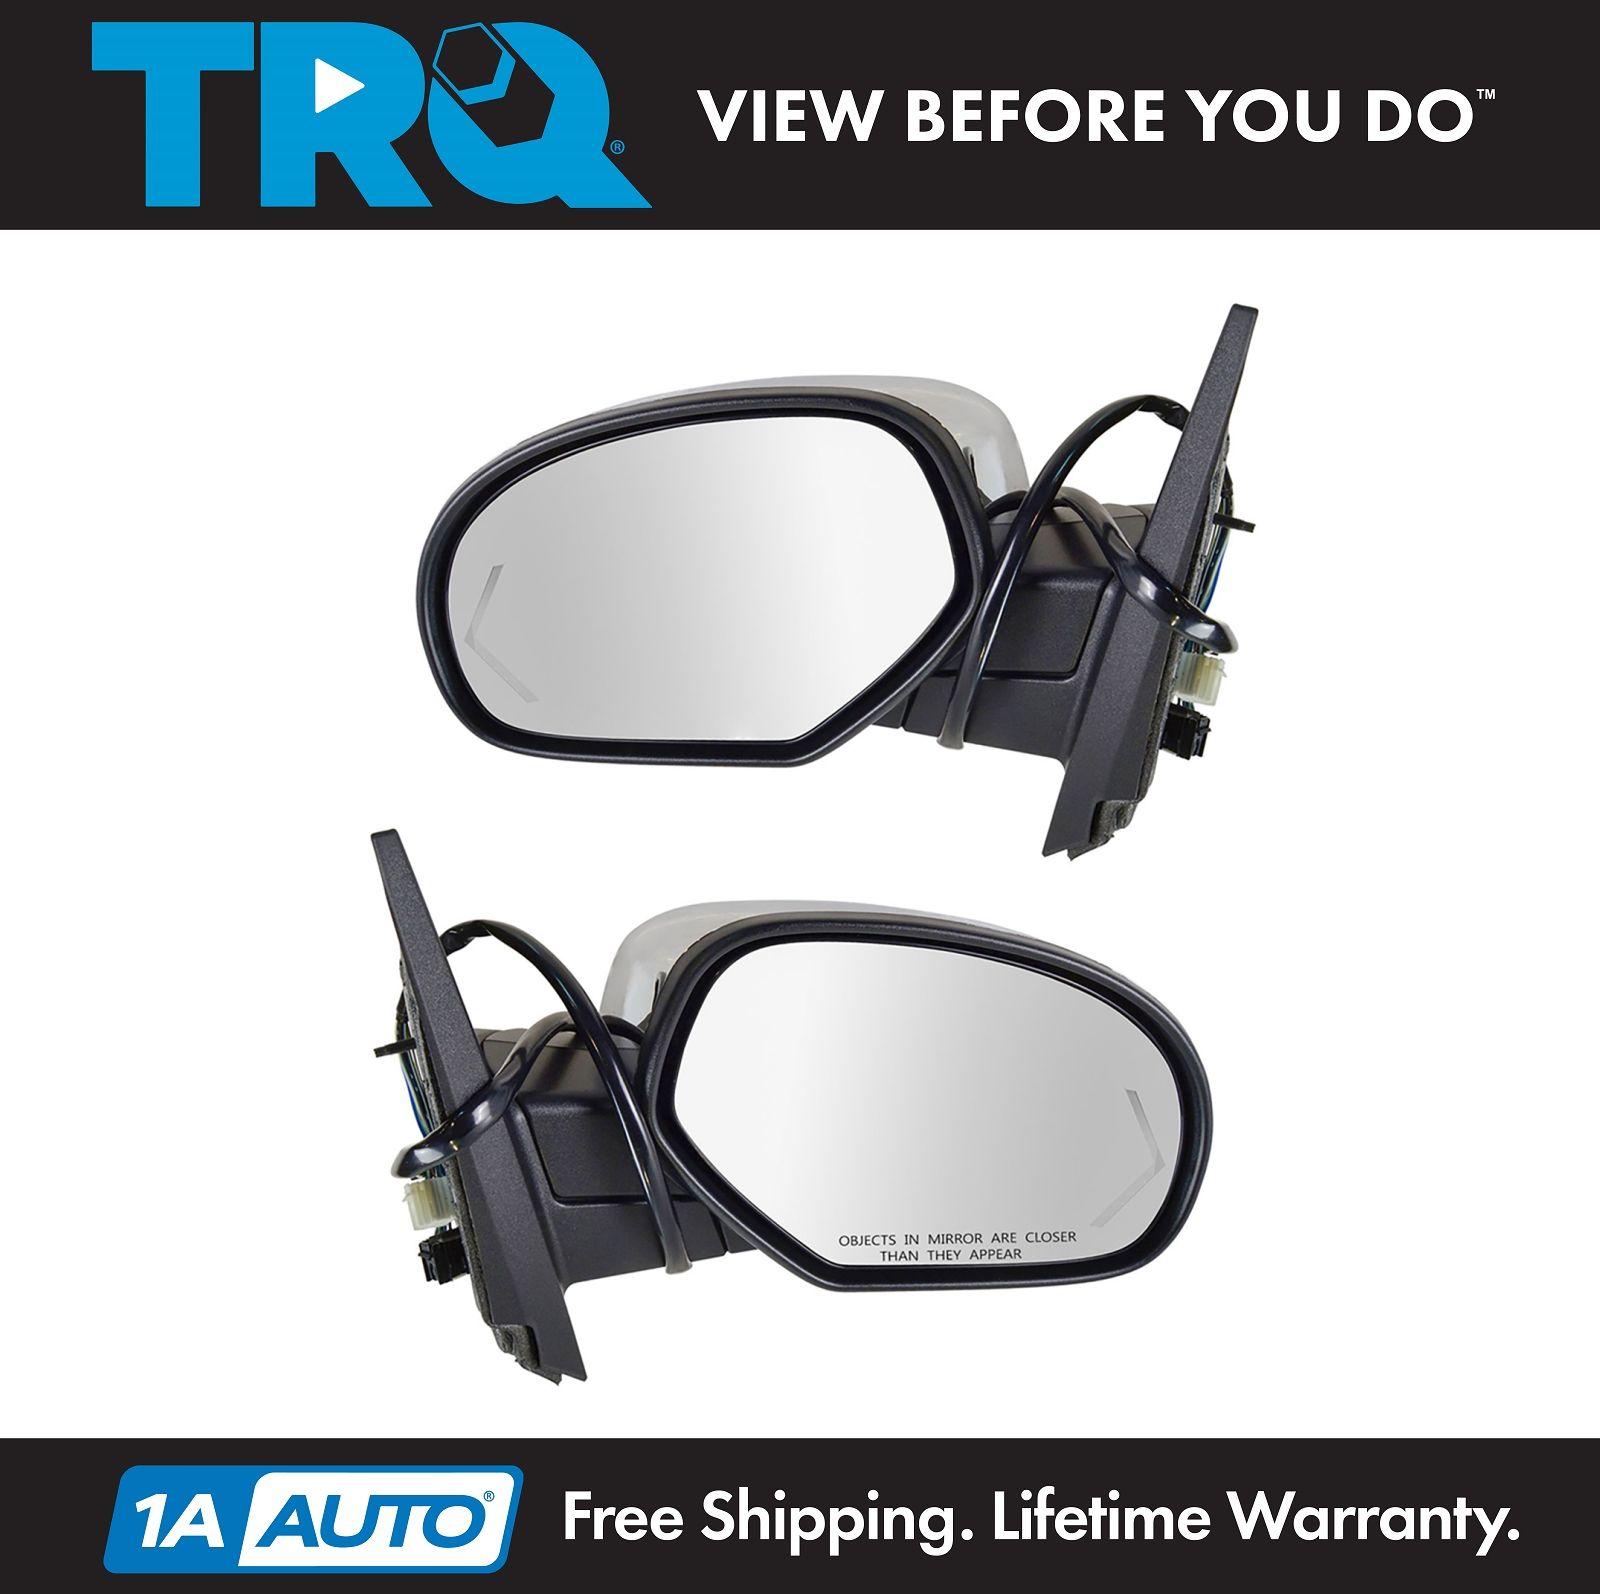 11-12 Grand Cherokee Power Heat Manual Fold Door Mirror Left Right Side SET PAIR